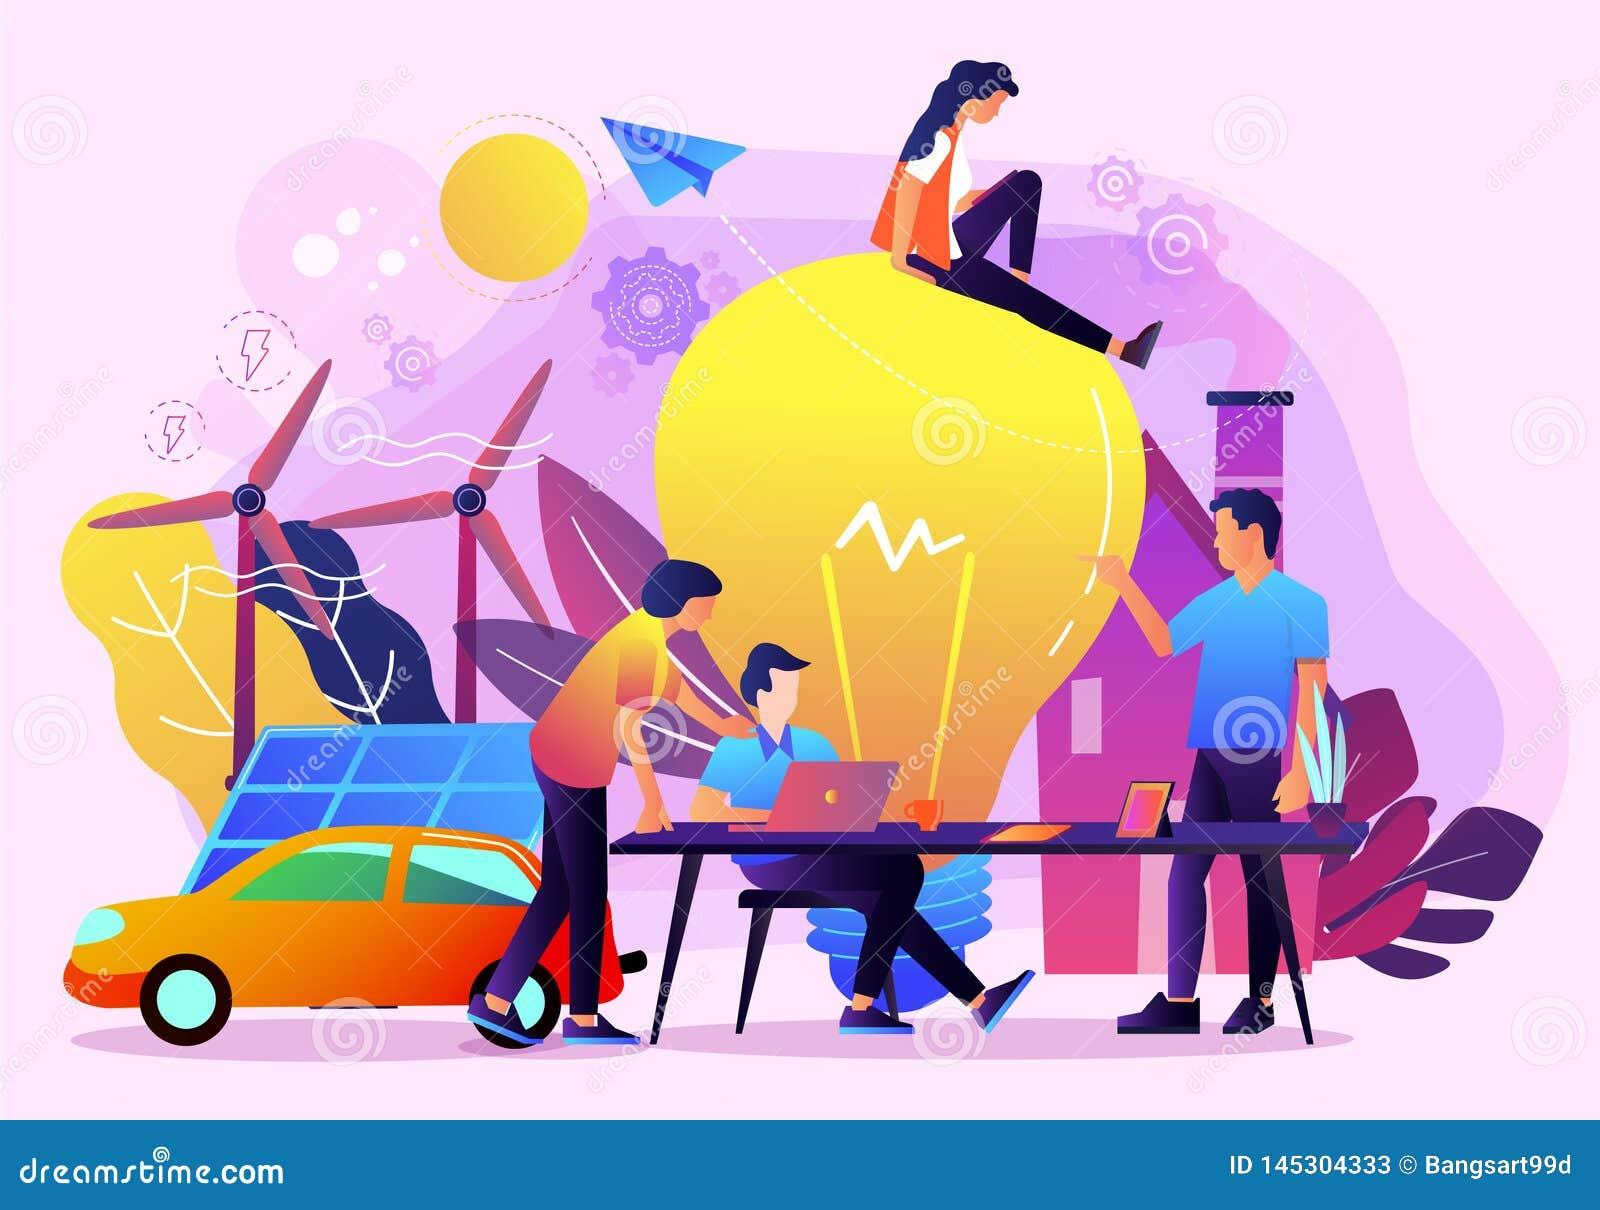 Creative idea business teamowrok vector illustration